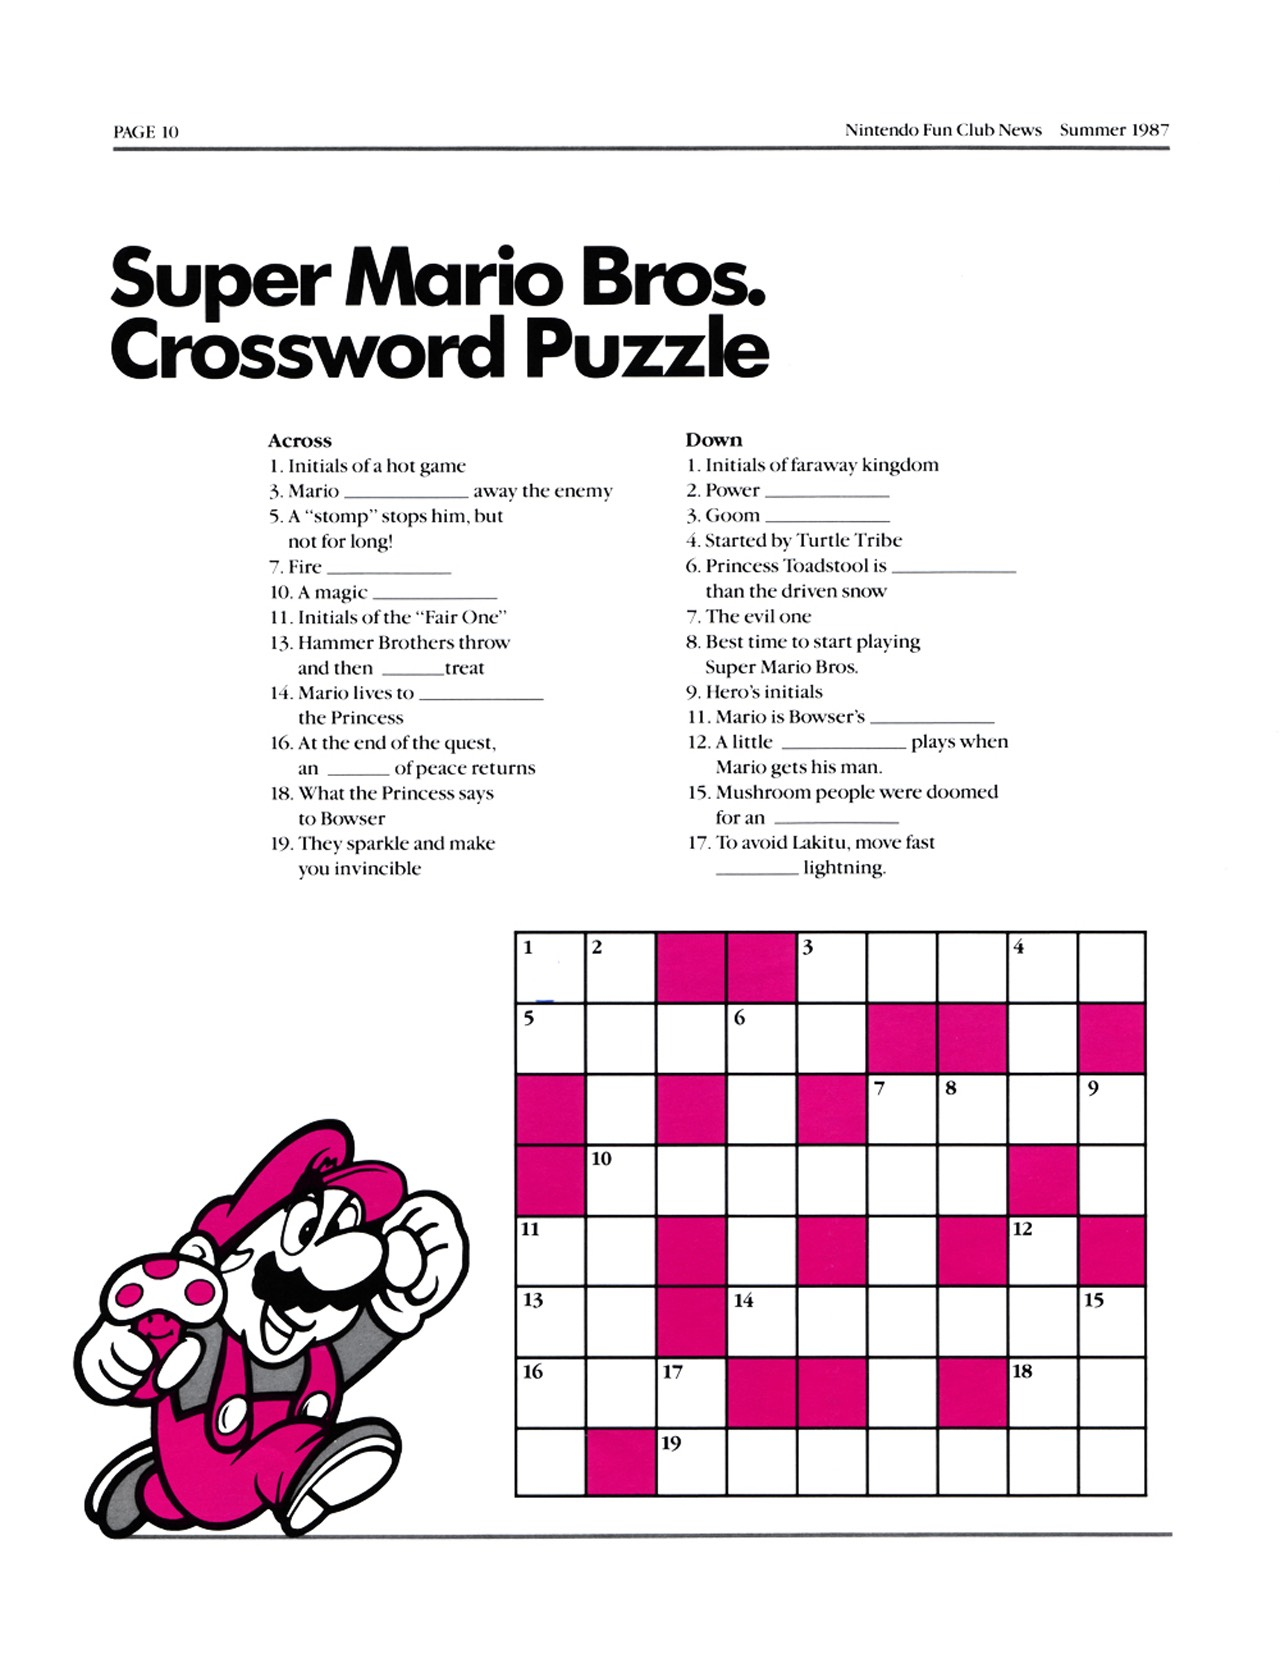 Nintendo Fun Club News - Summer 1987 - p10